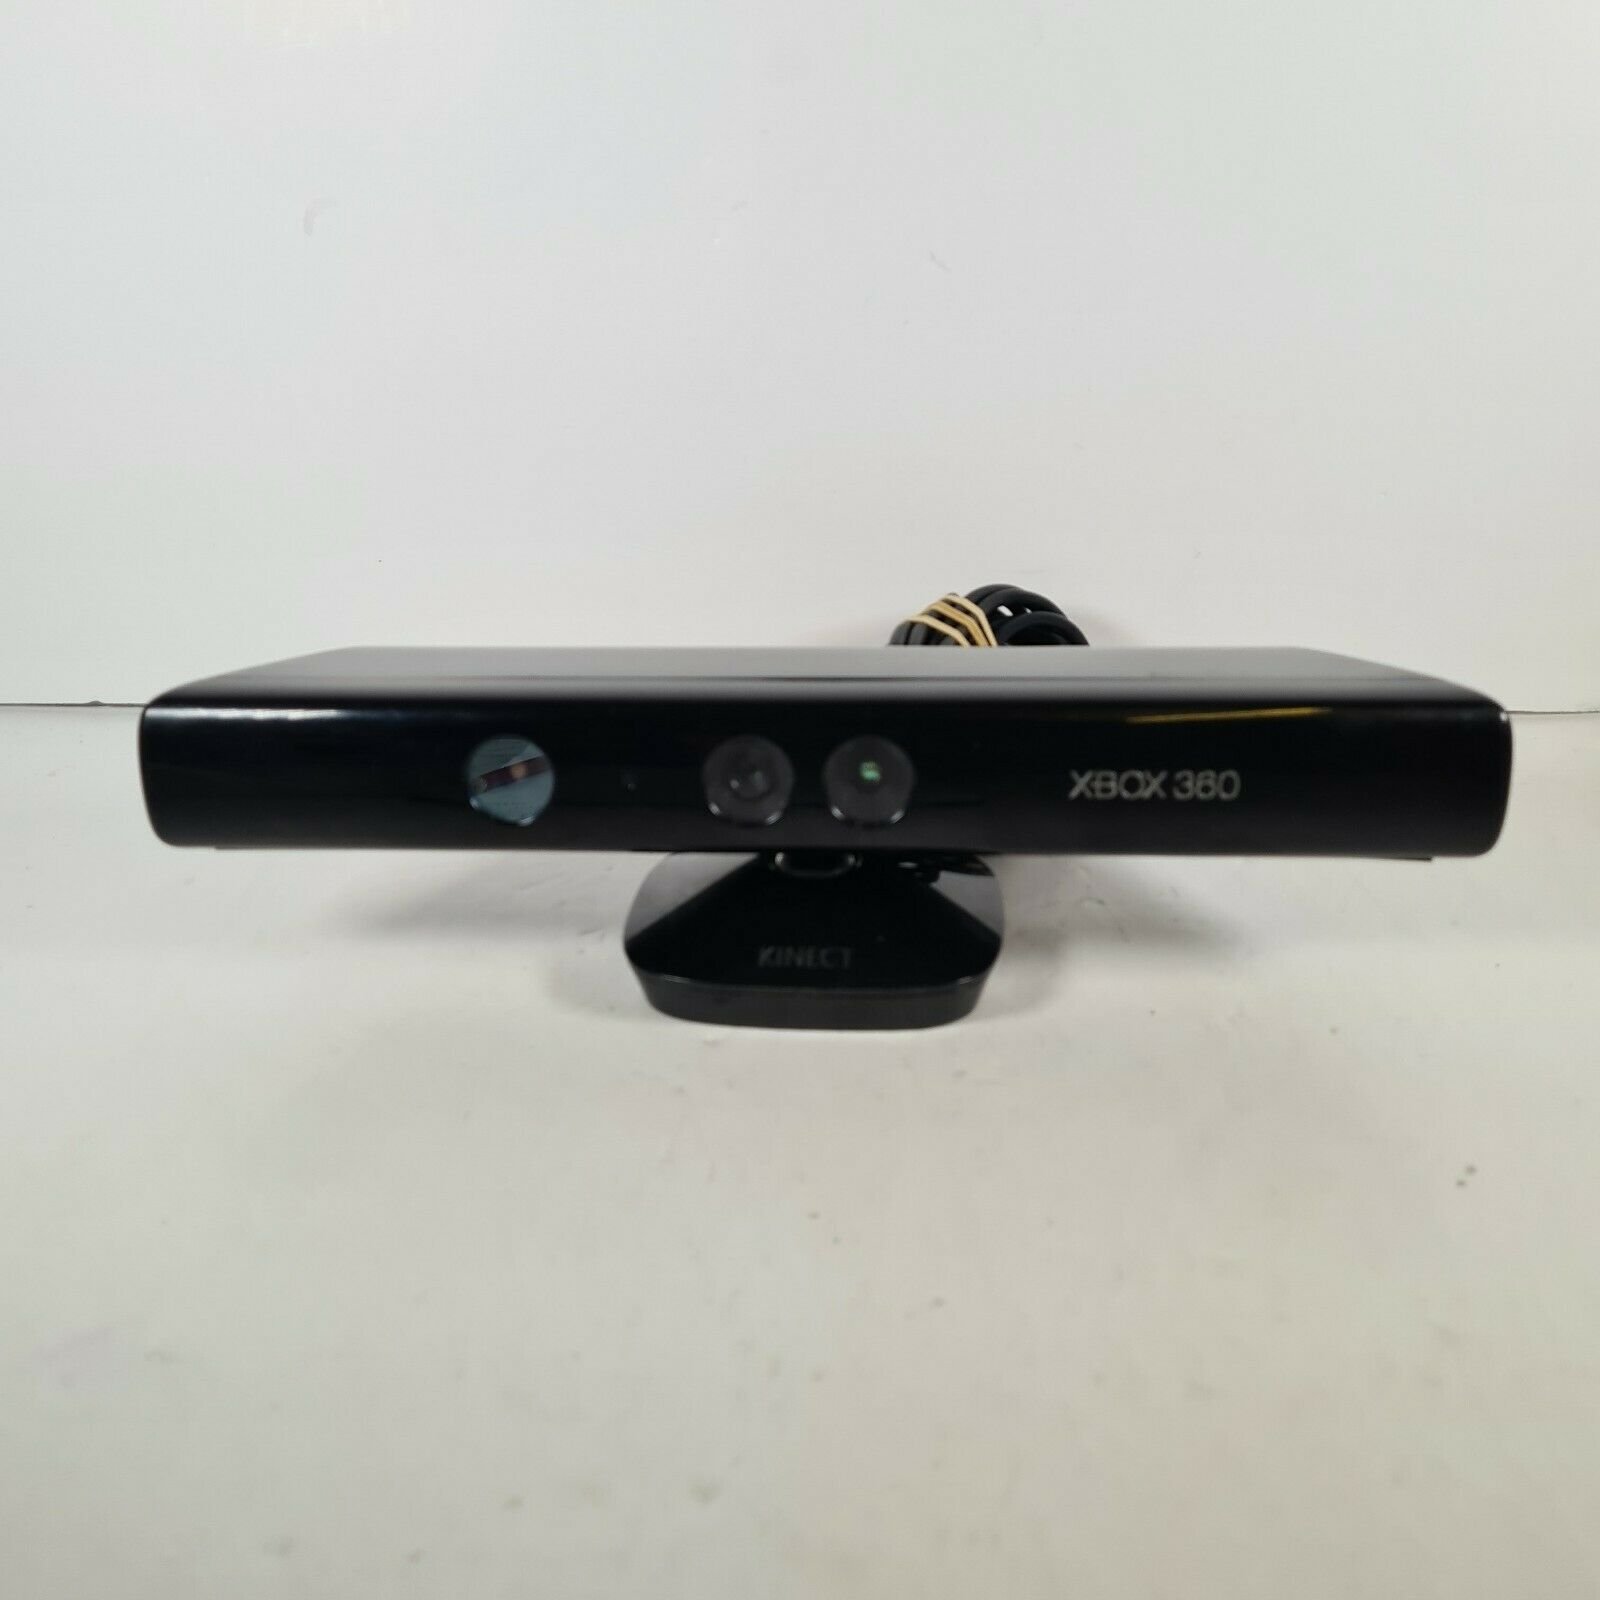 Official Microsoft XBOX 360 Kinect Motion Sensor Camera - Free uk postage